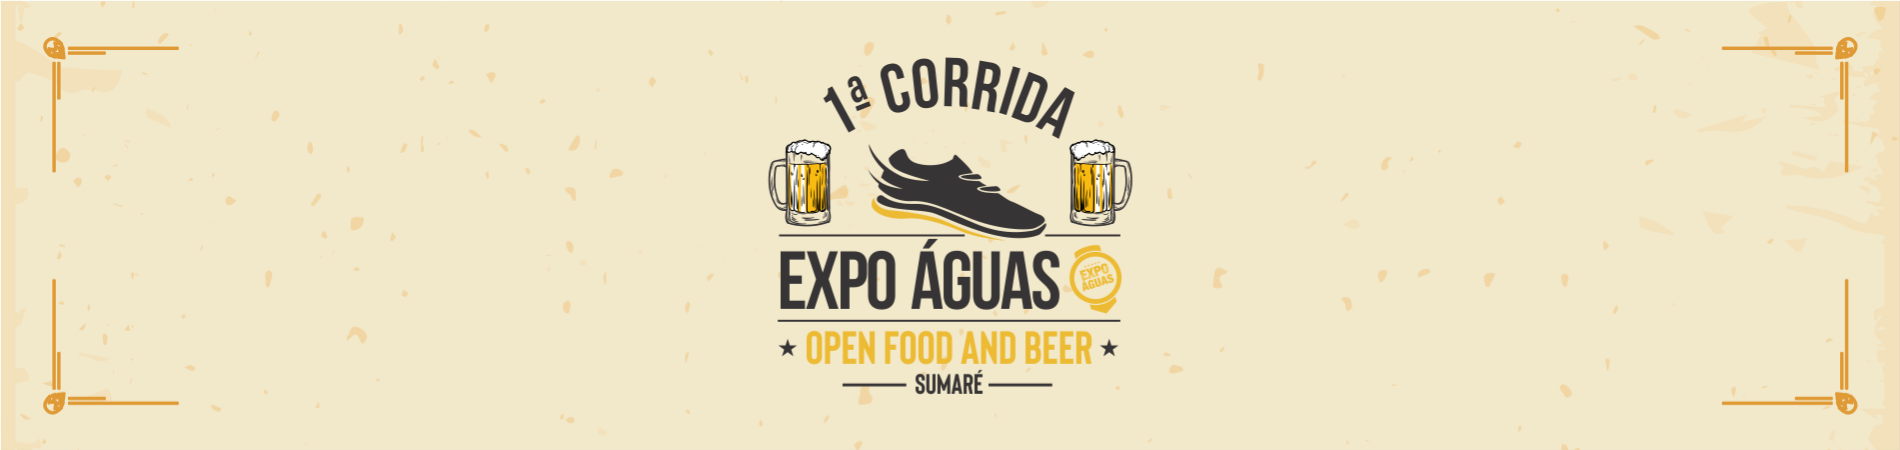 1ª CORRIDA EXPO ÁGUAS OPEN FOOD AND BEER